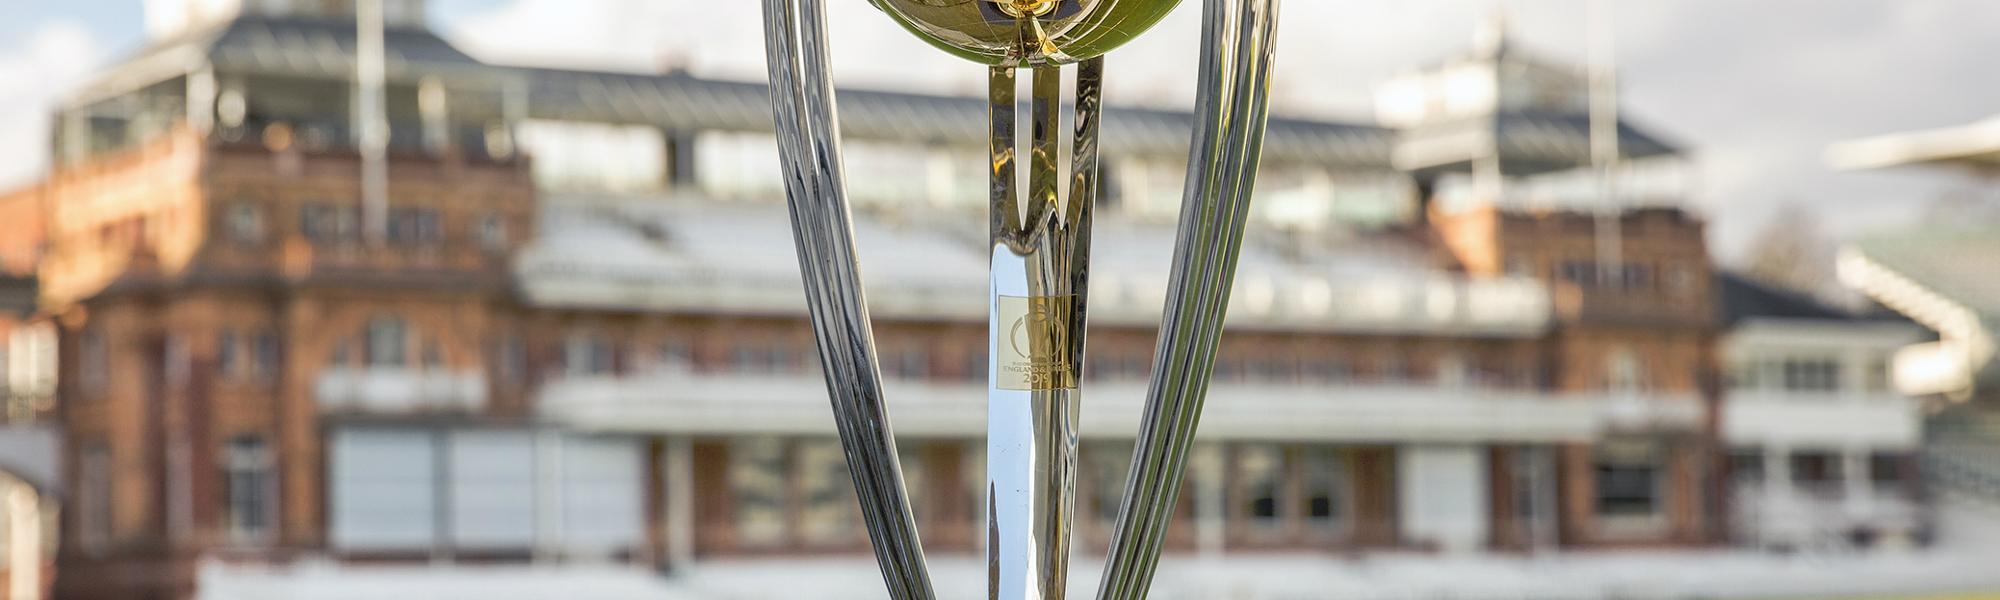 ICC Cricket World Cup